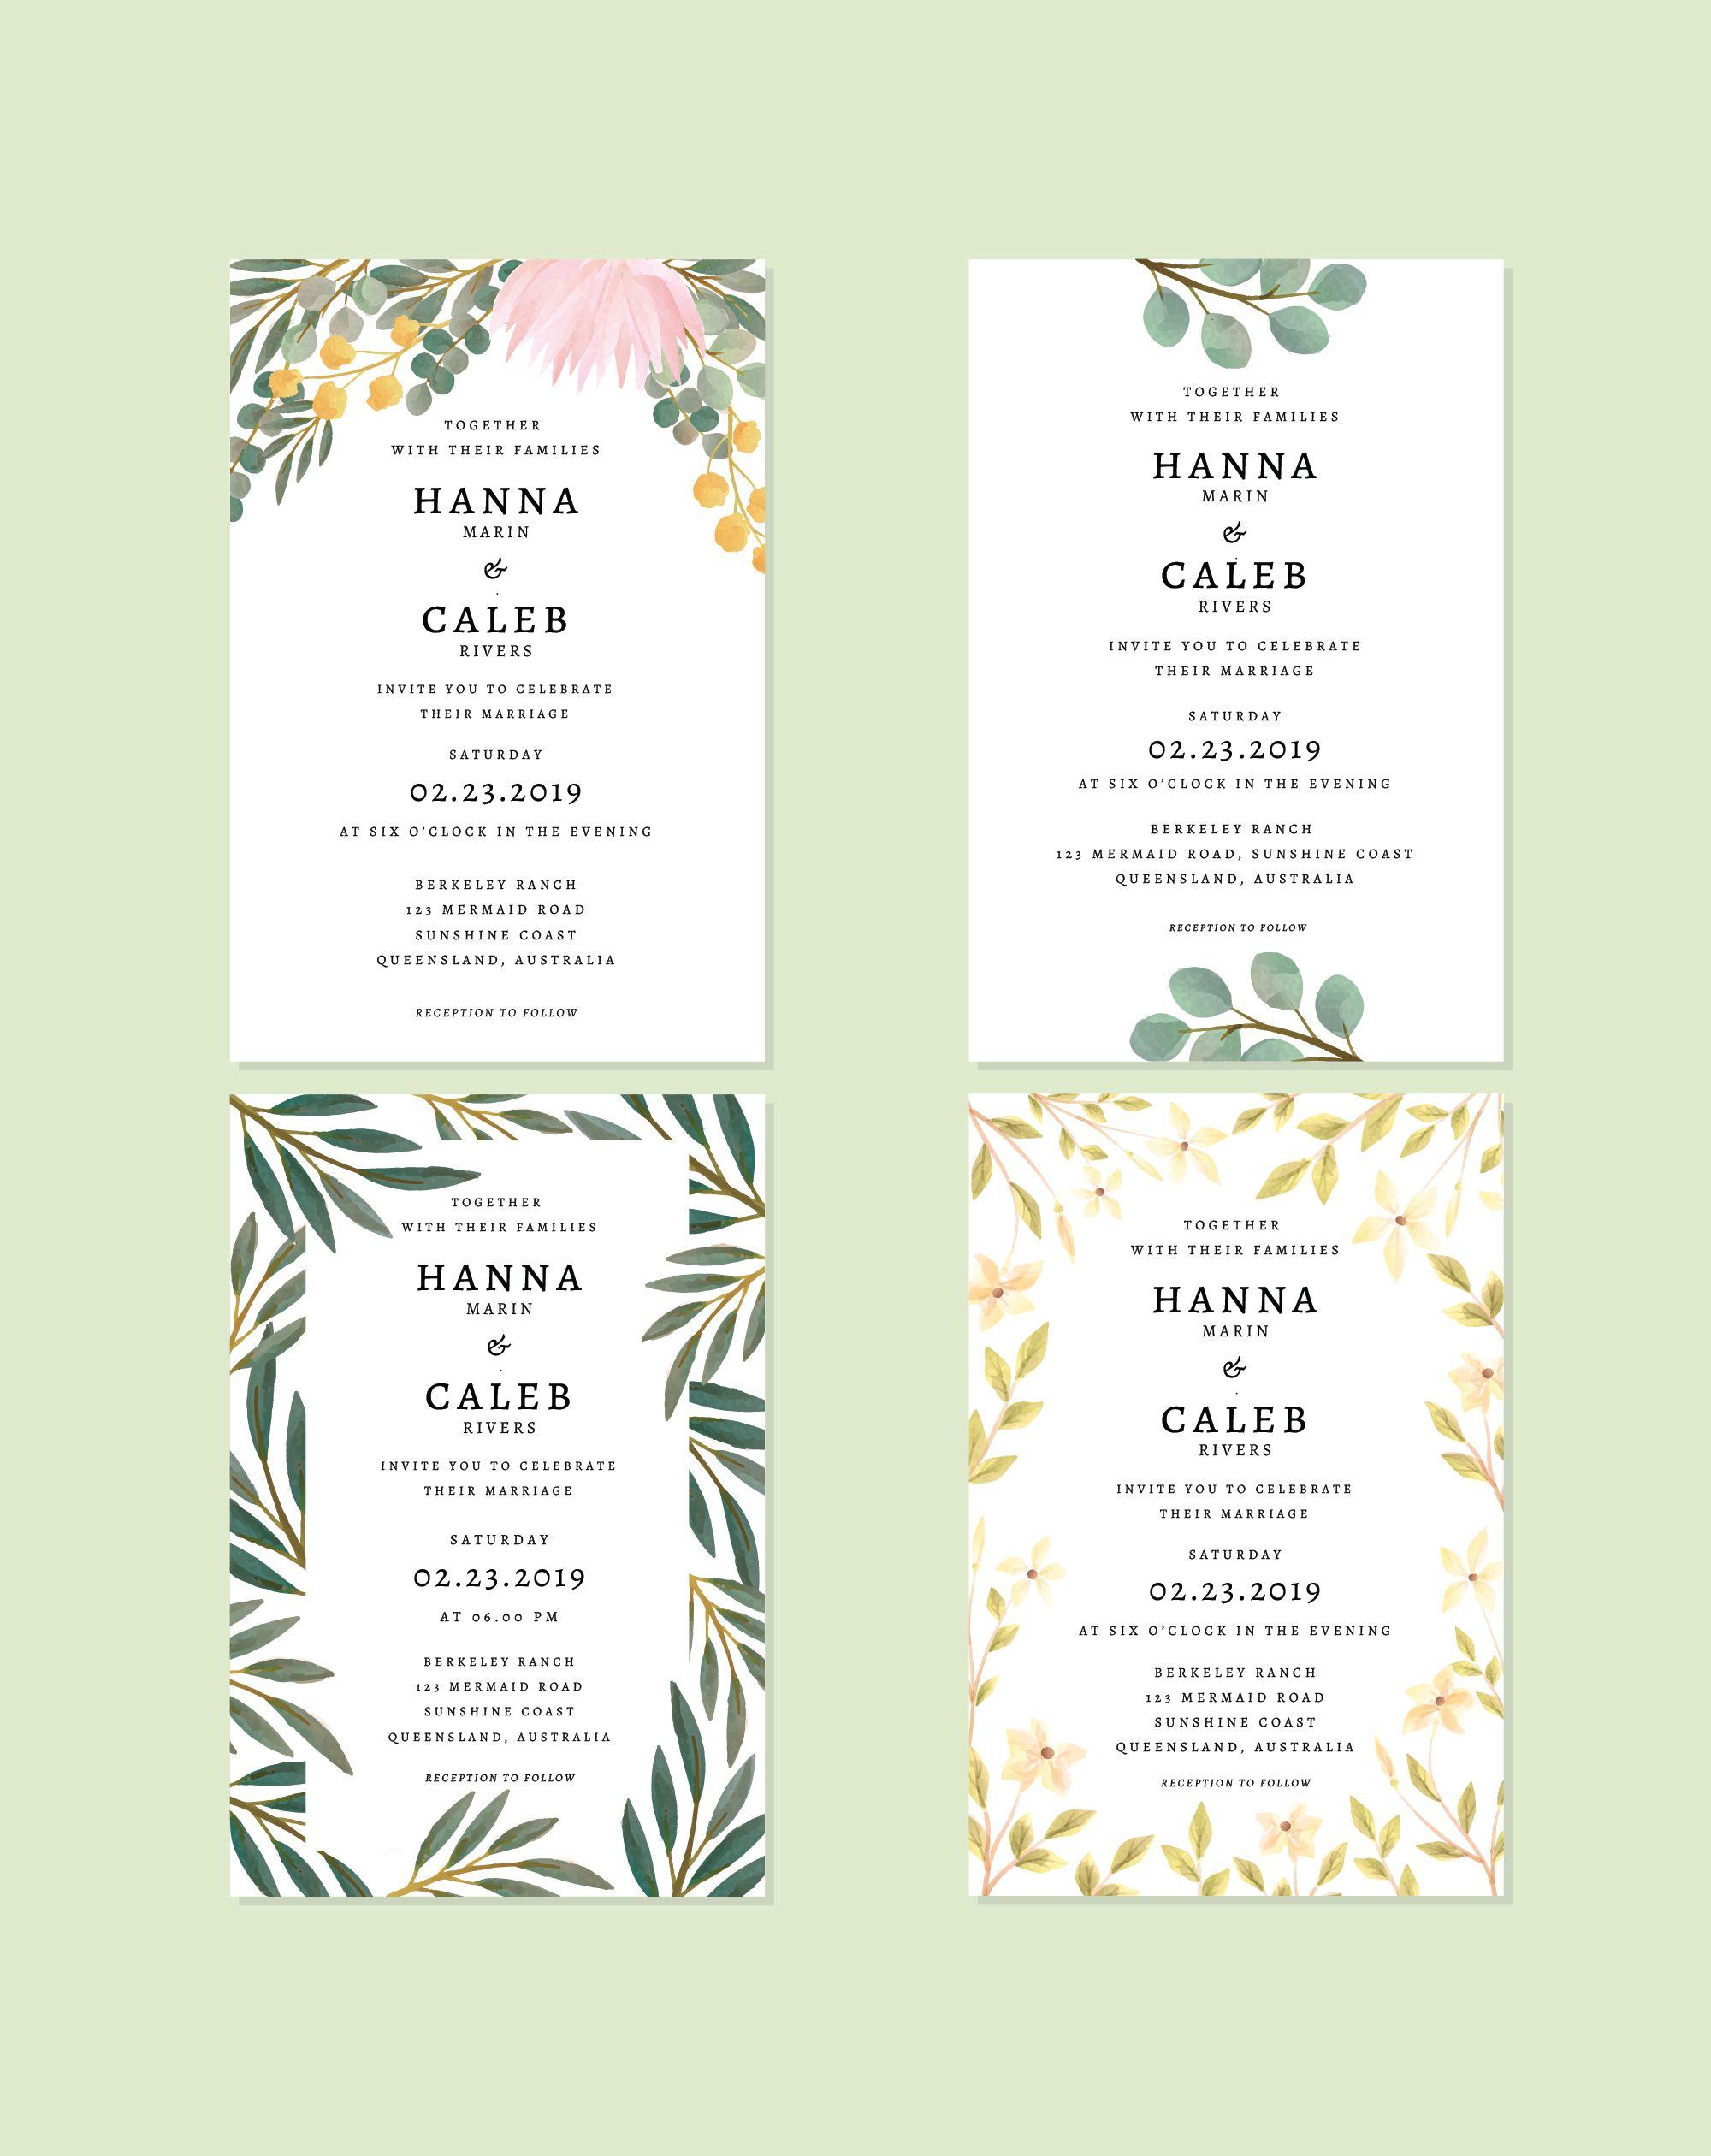 Botanical Wedding Invitation 99designs Wedding Cards Wedding Invitations Australia Botanical Wedding Invitations